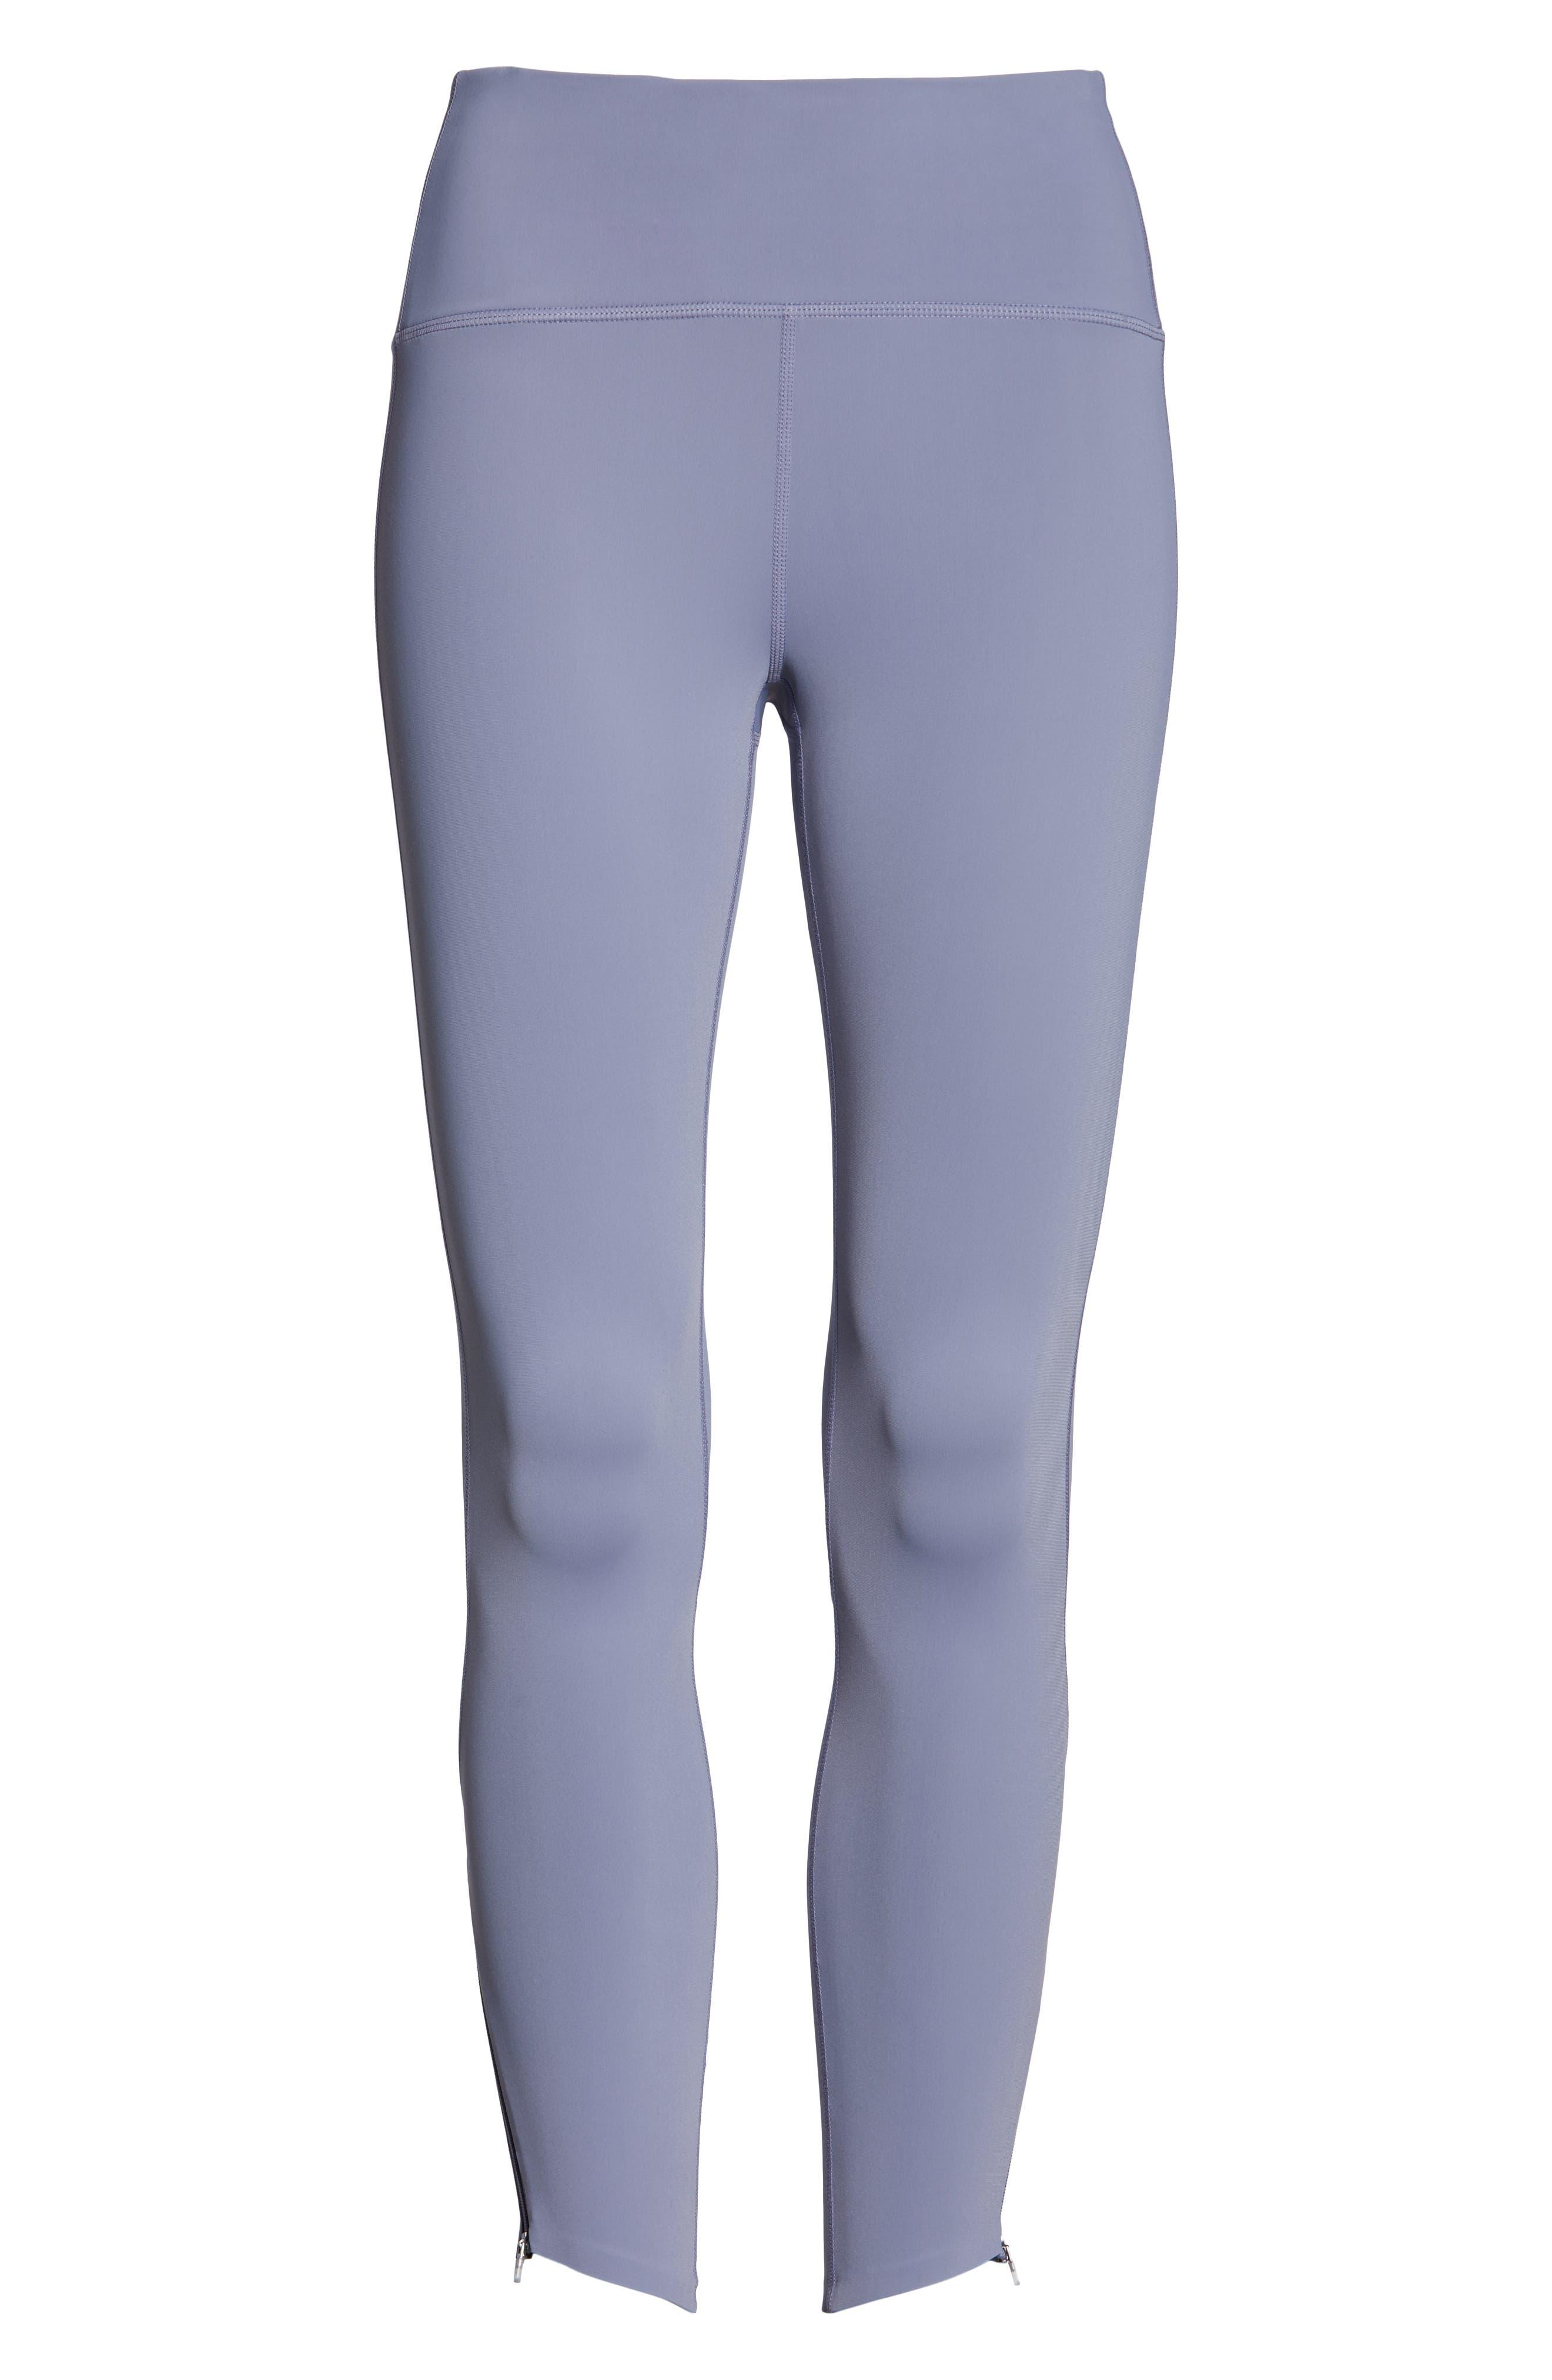 ZELLA, Luella Luxe High Waist 7/8 Leggings, Alternate thumbnail 7, color, GREY GRANITE